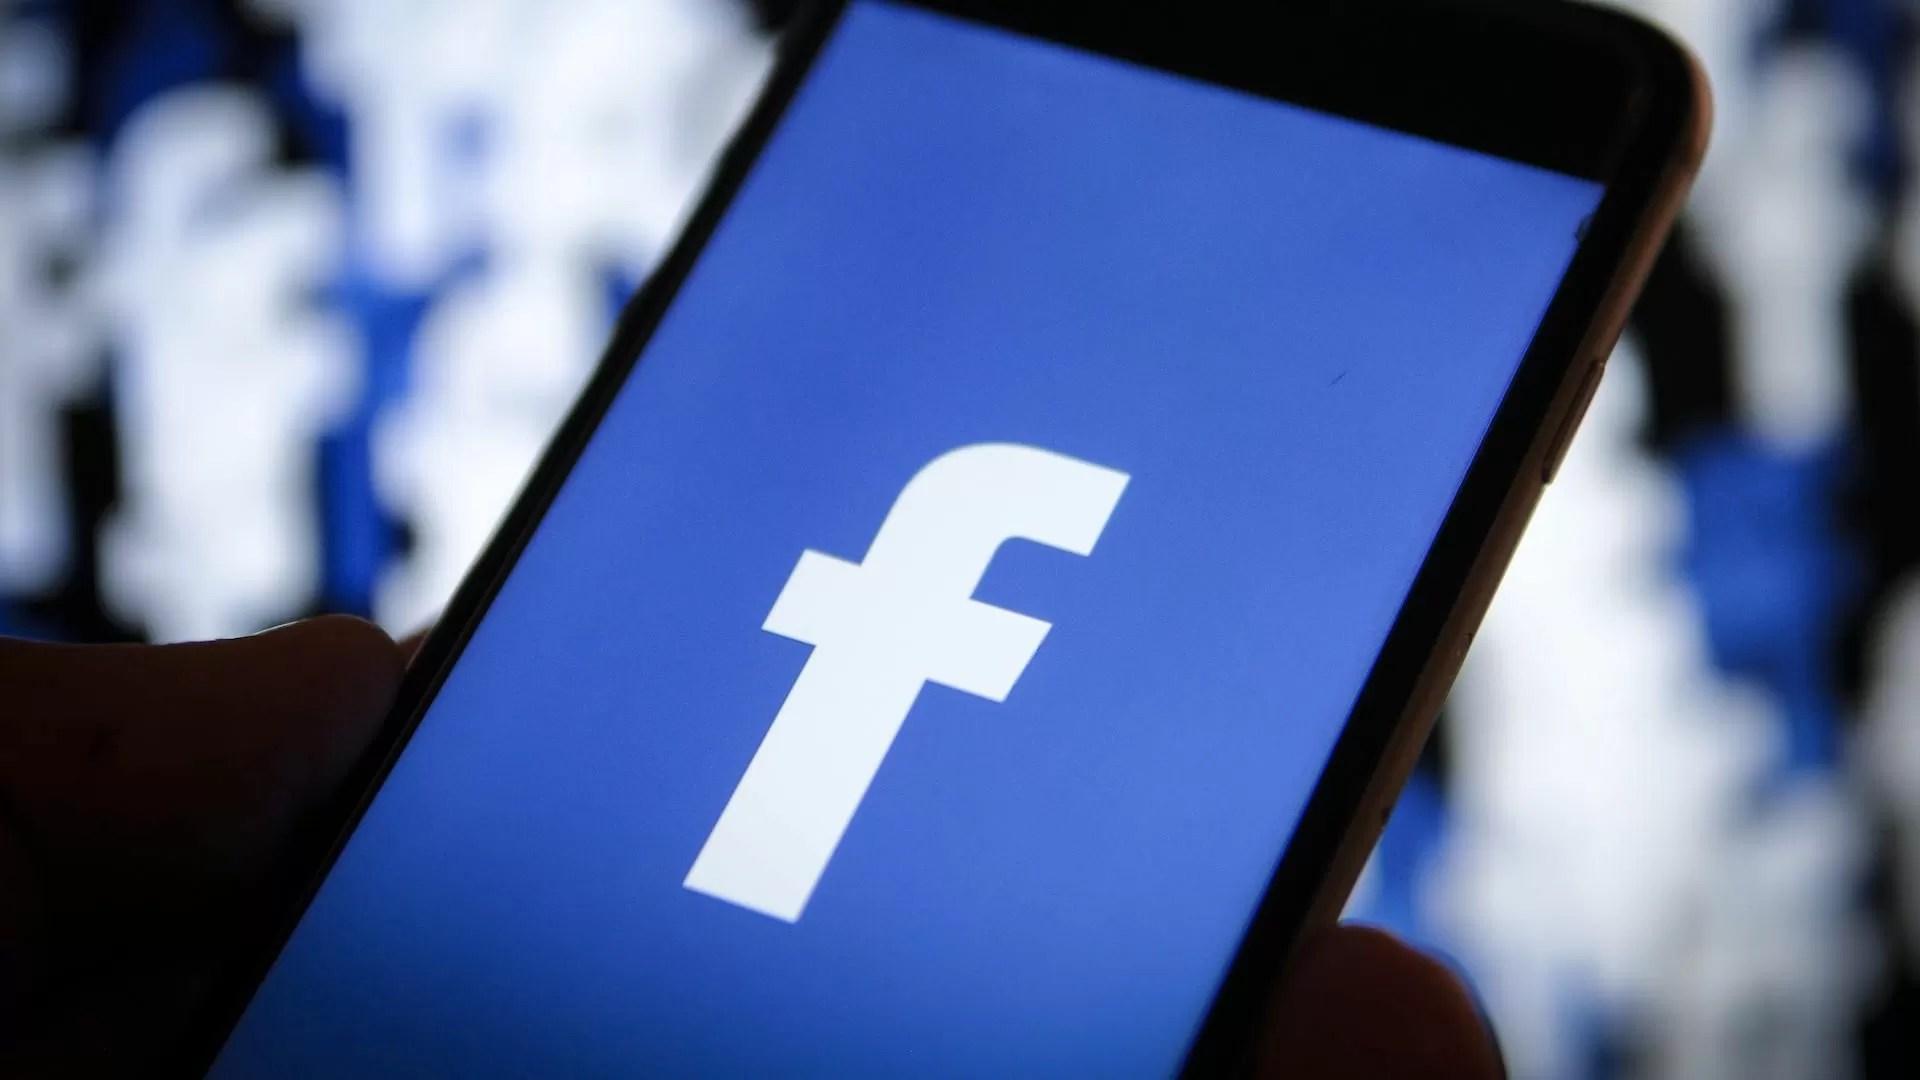 Scandalo dei dati, Facebook indaga e sospende 200 app